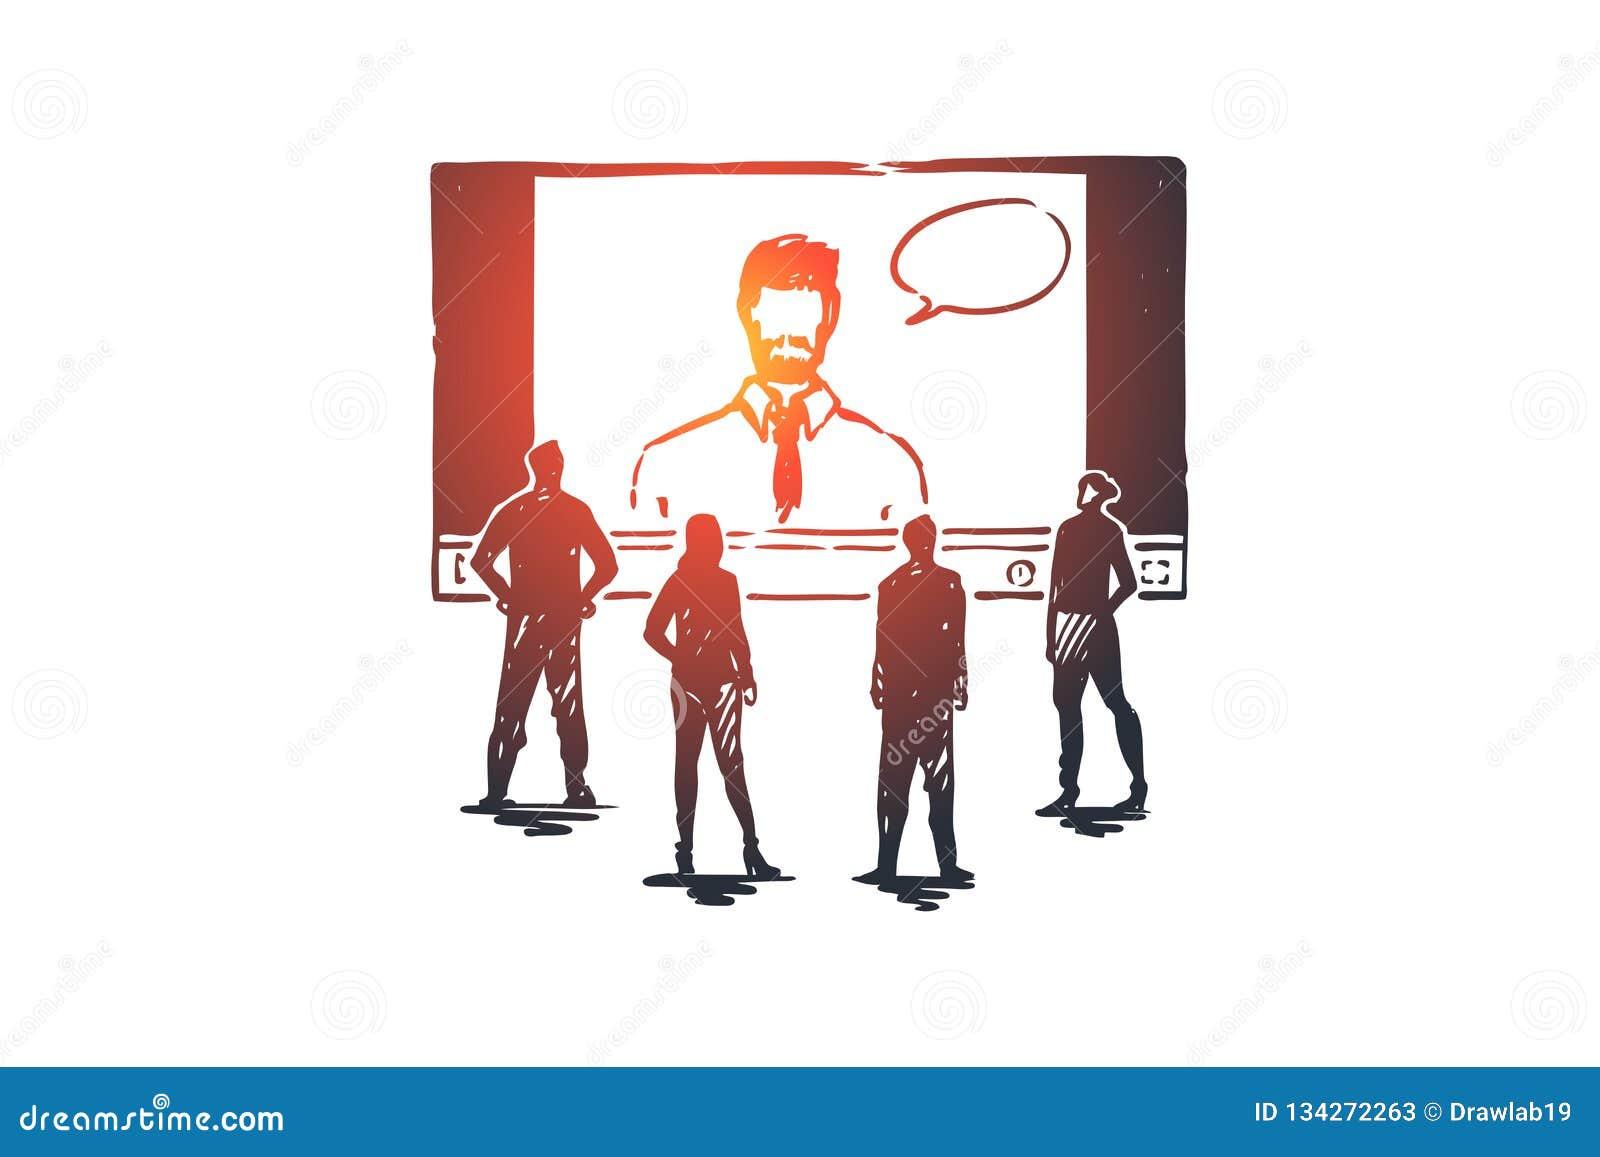 On-line, lernend, System, Netz, Trainingskonzept Hand gezeichneter lokalisierter Vektor